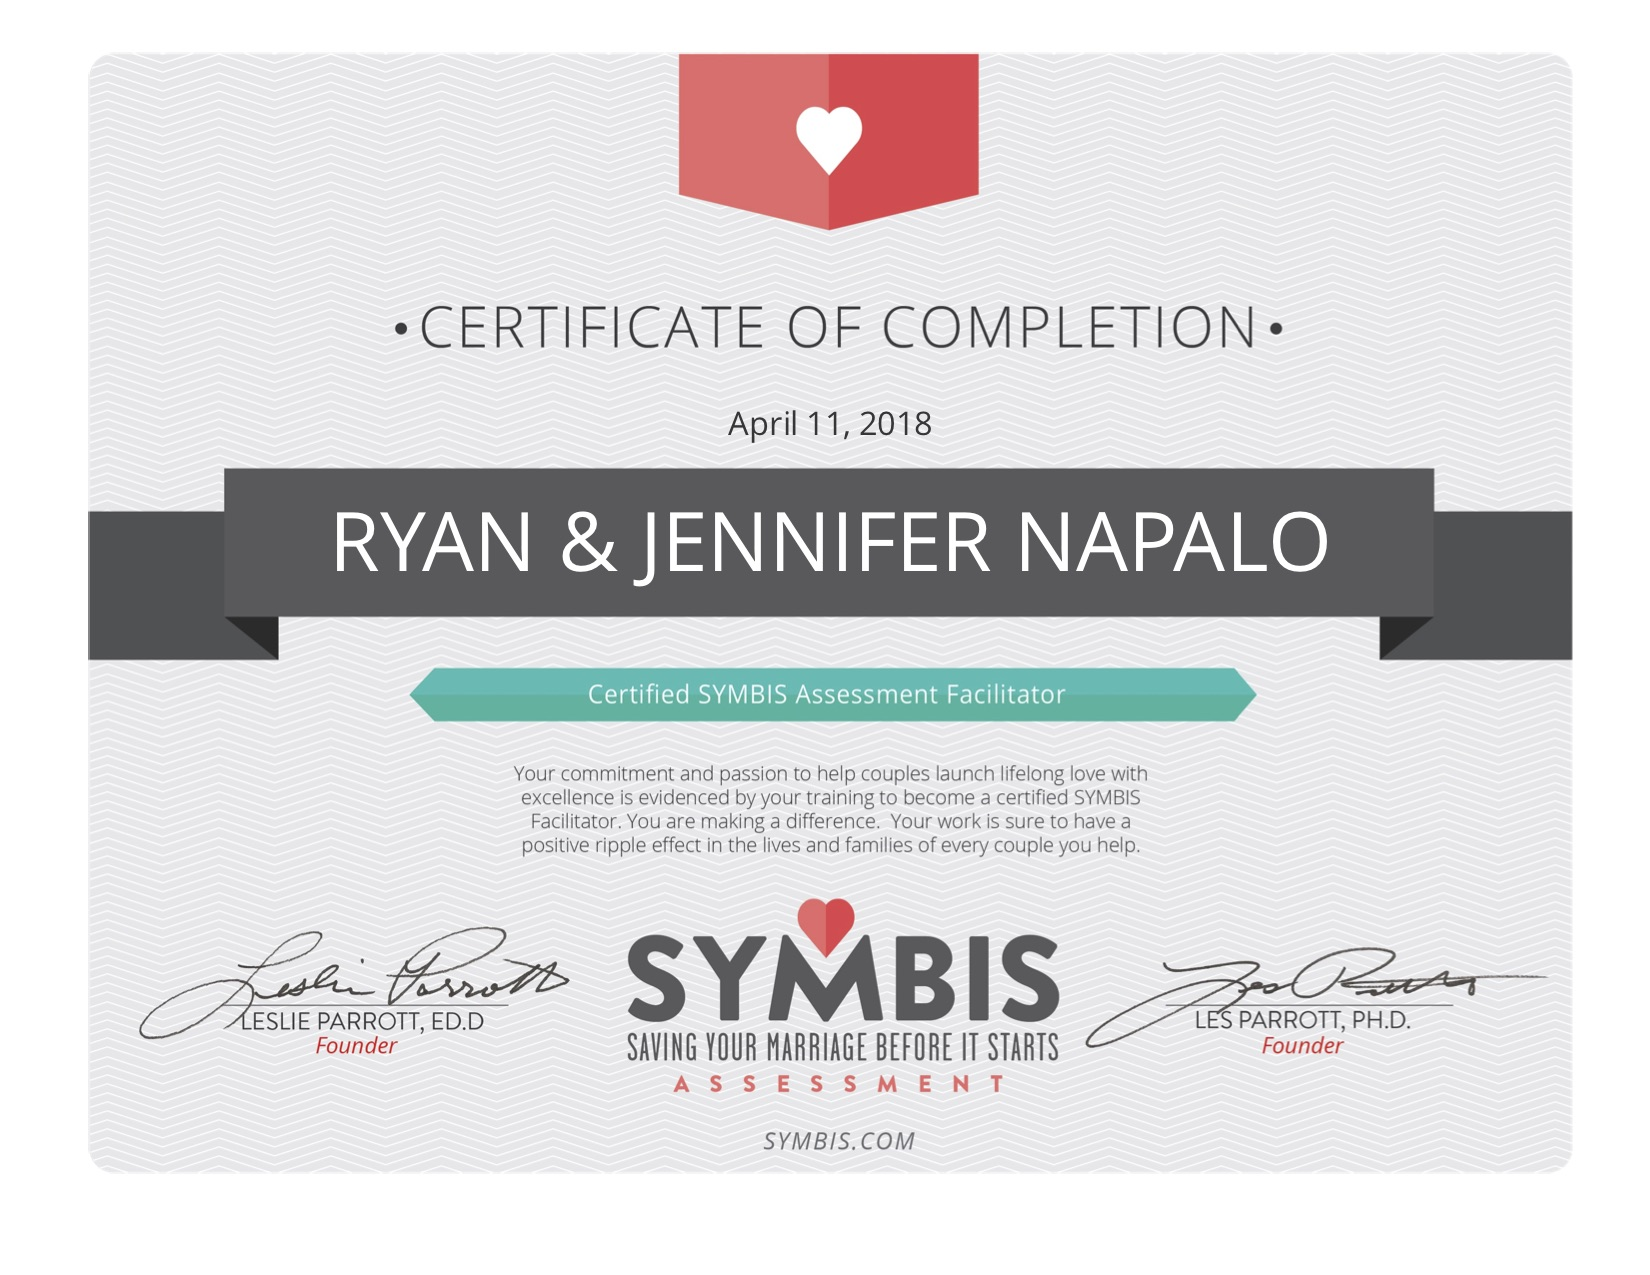 SYMBIS Facilitator Certificate